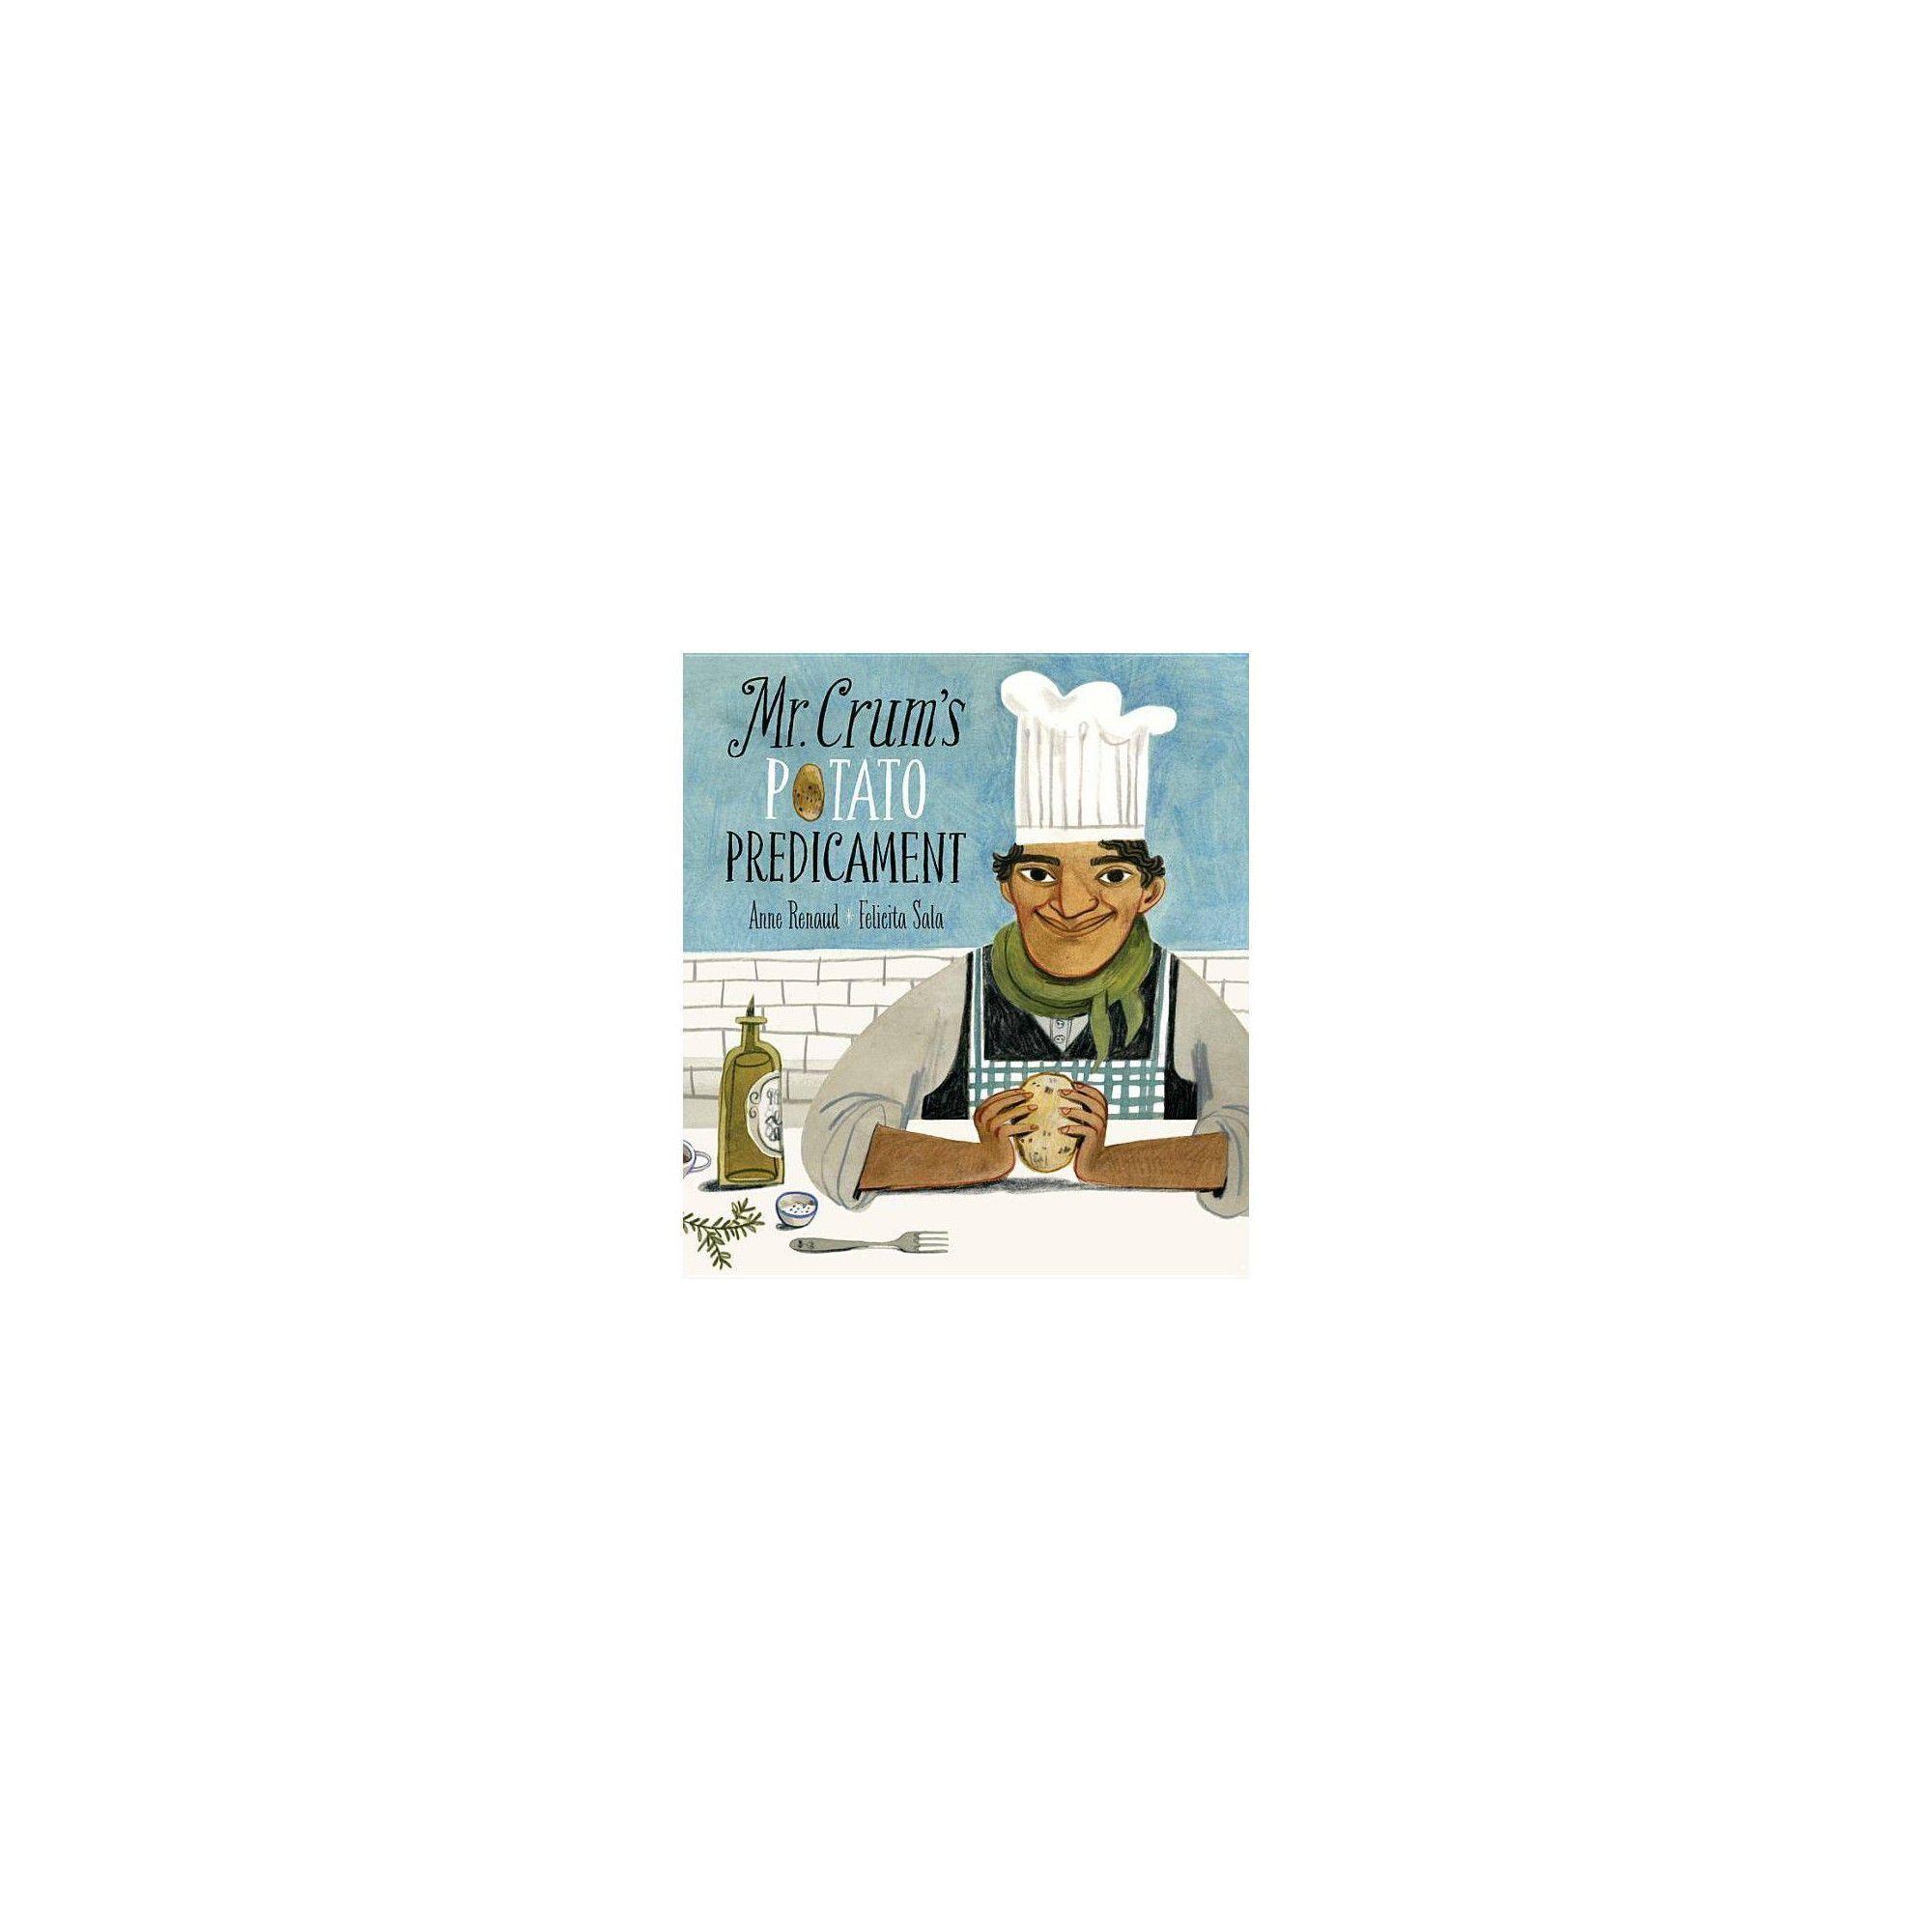 Mr. Crum's Potato Predicament - by Anne Renaud (Hardcover) #potatowedgesselbermachen Mr. Crum's Potato Predicament - by Anne Renaud (Hardcover) #potatowedgesselbermachen Mr. Crum's Potato Predicament - by Anne Renaud (Hardcover) #potatowedgesselbermachen Mr. Crum's Potato Predicament - by Anne Renaud (Hardcover) #potatowedgesselbermachen Mr. Crum's Potato Predicament - by Anne Renaud (Hardcover) #potatowedgesselbermachen Mr. Crum's Potato Predicament - by Anne Renaud (Hardcover) #potatowedgessel